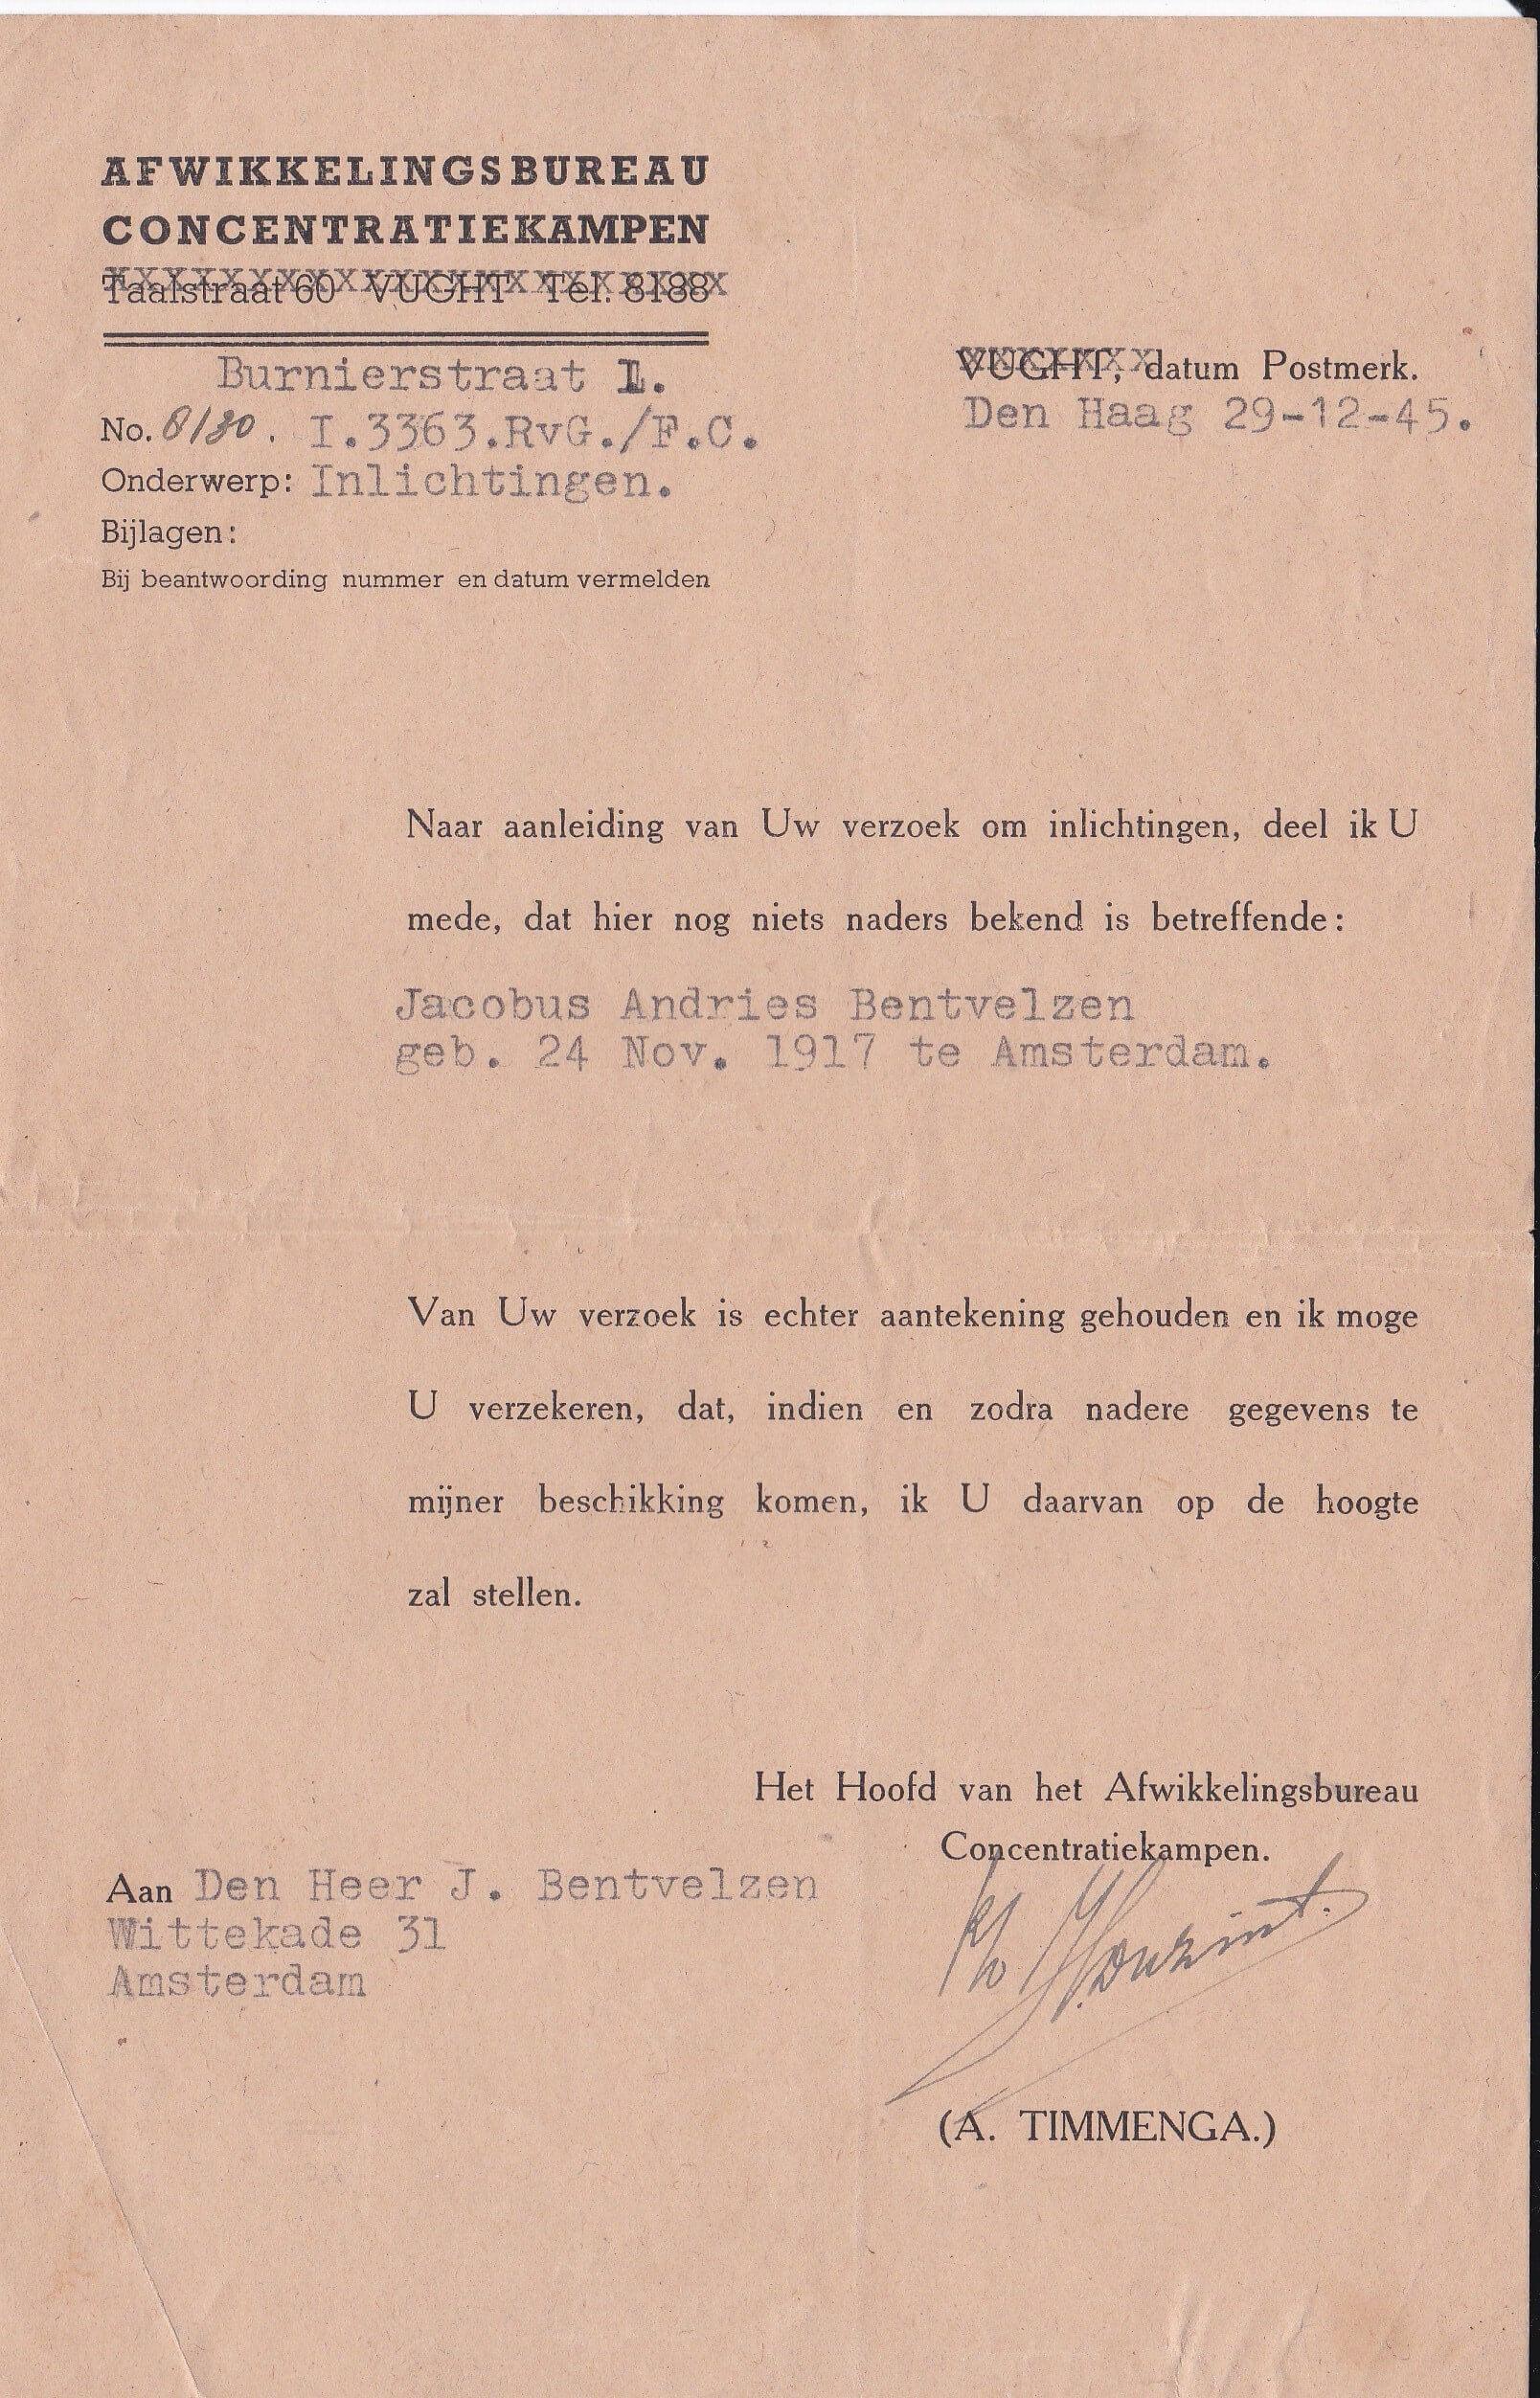 afwikkelingsbureau concentratiekampen 29-12-1945